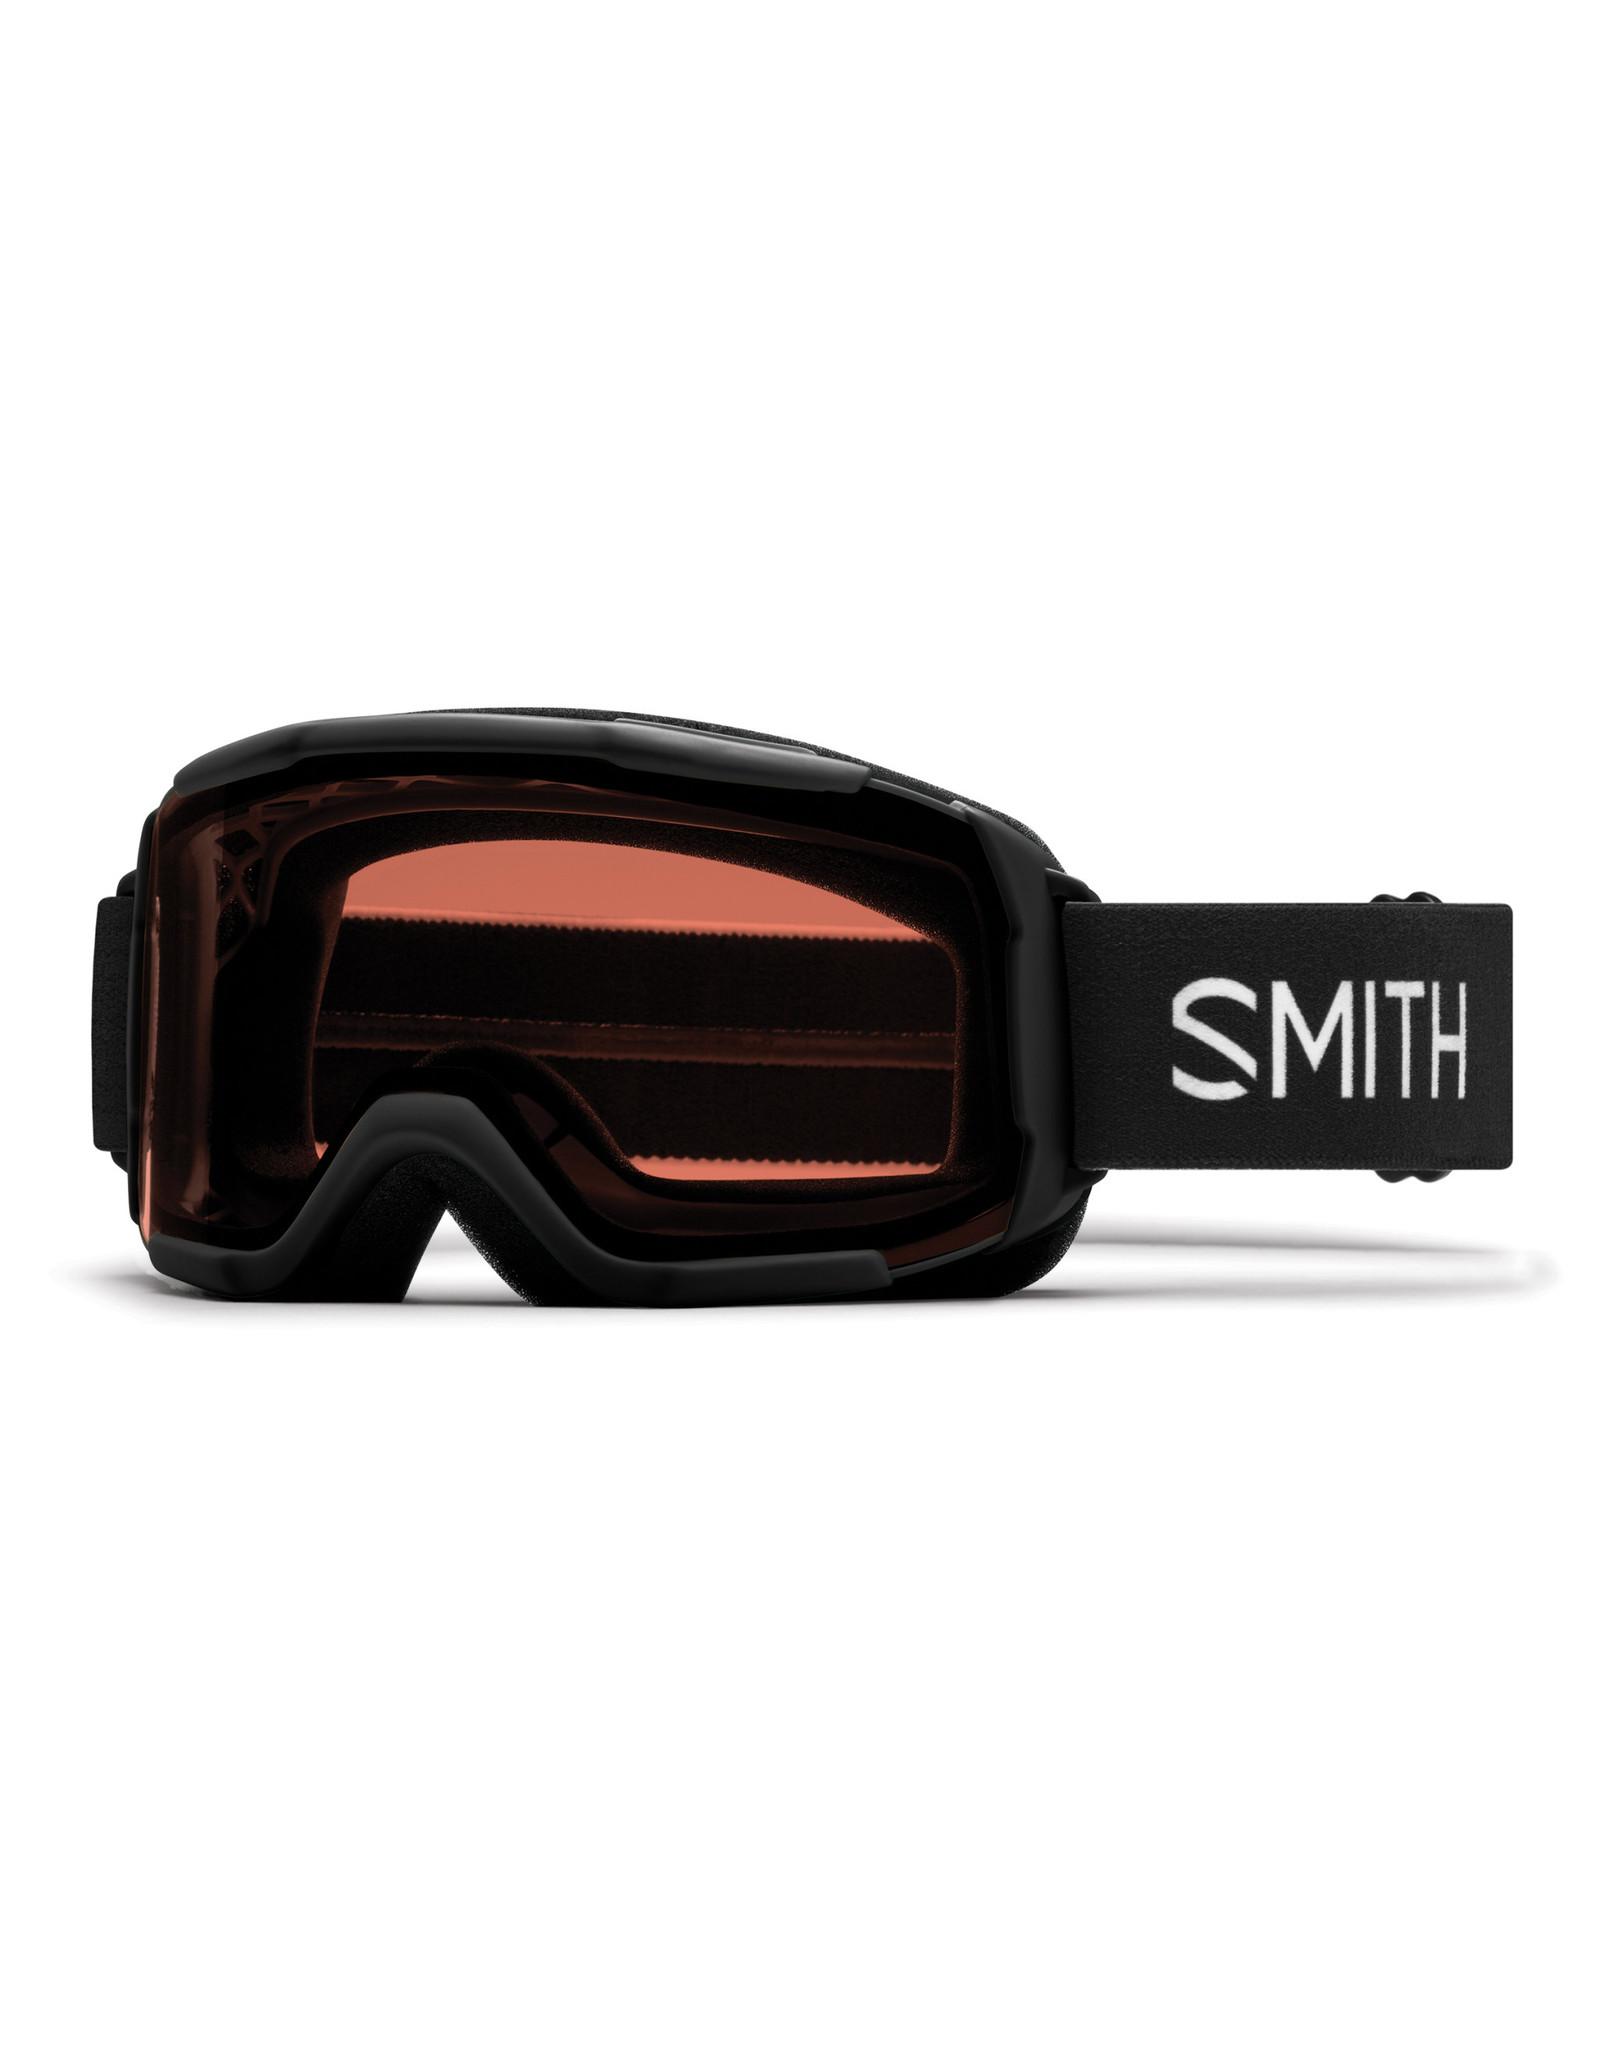 Smith SMITH DAREDEVIL BLACK 20 LUNETTE SKI JUNIOR